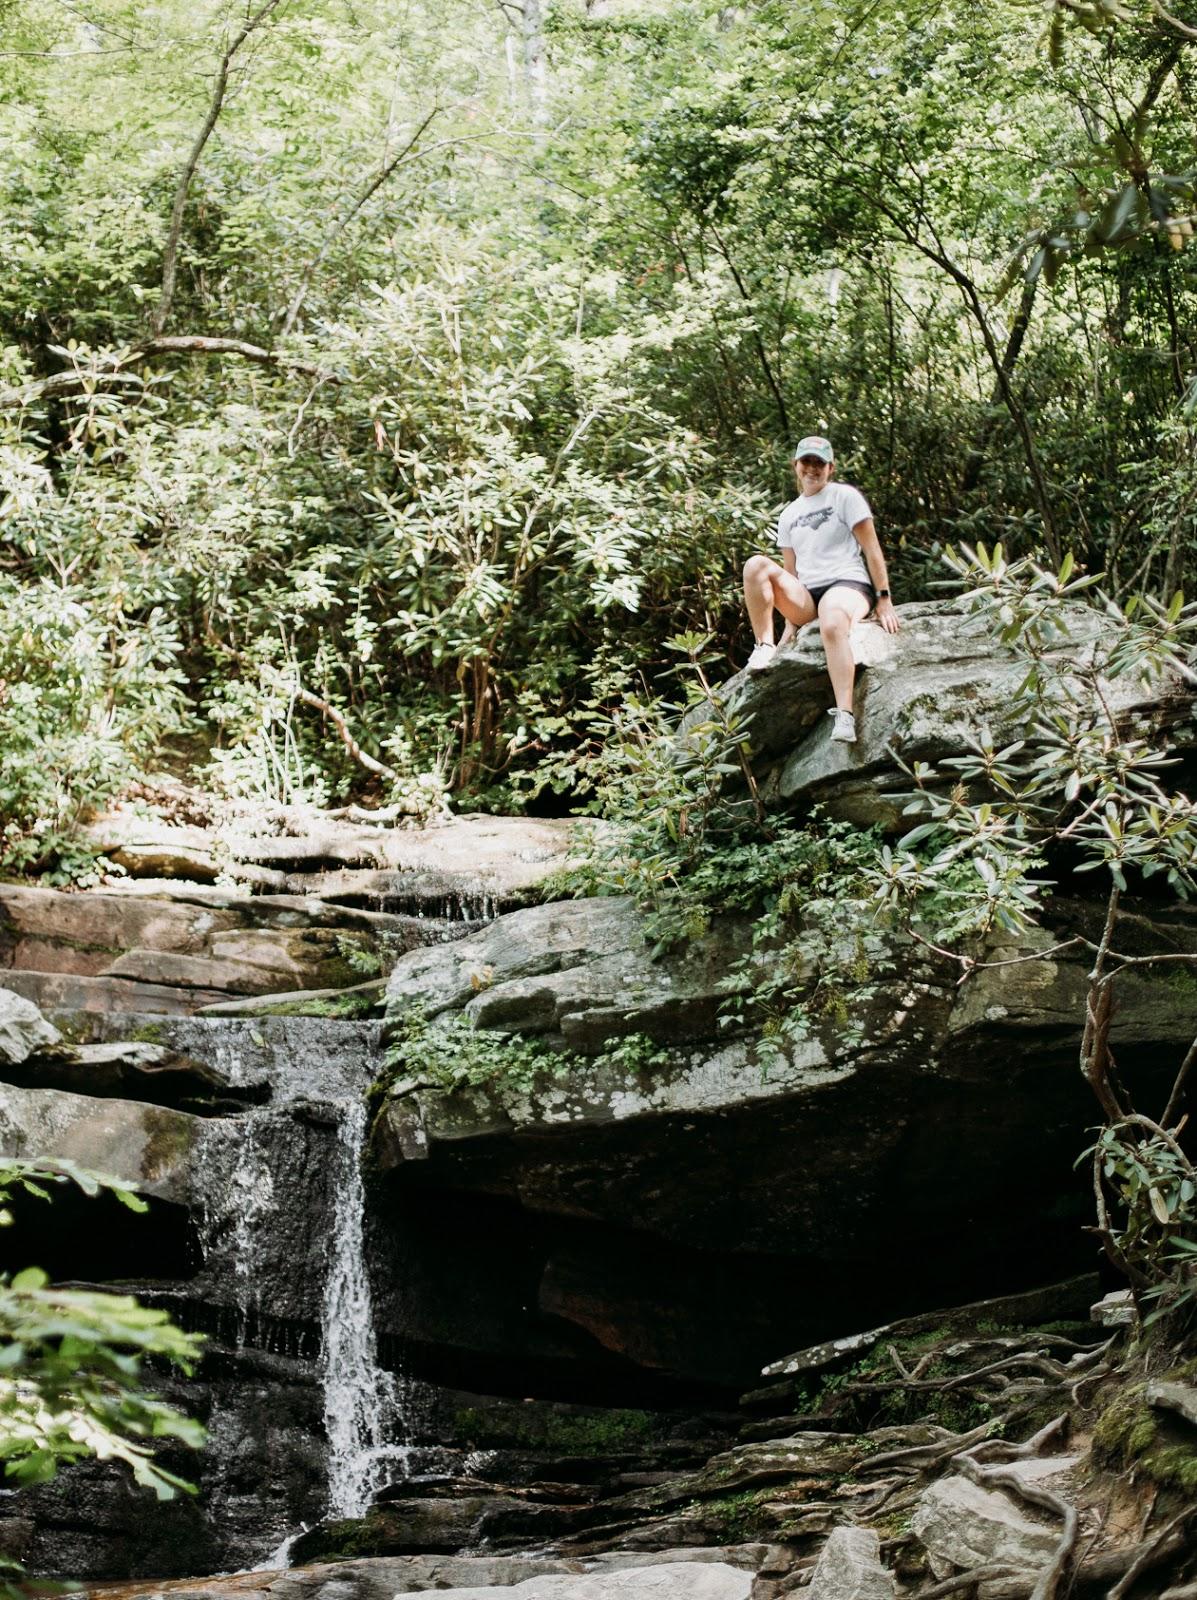 hanging rock nc, hiking nc, camping nc, xo samantha brooke, life and messy hair, nc blogger, nc photographer, lifestyle blogger, explore nc, hanging rock, nc state parks